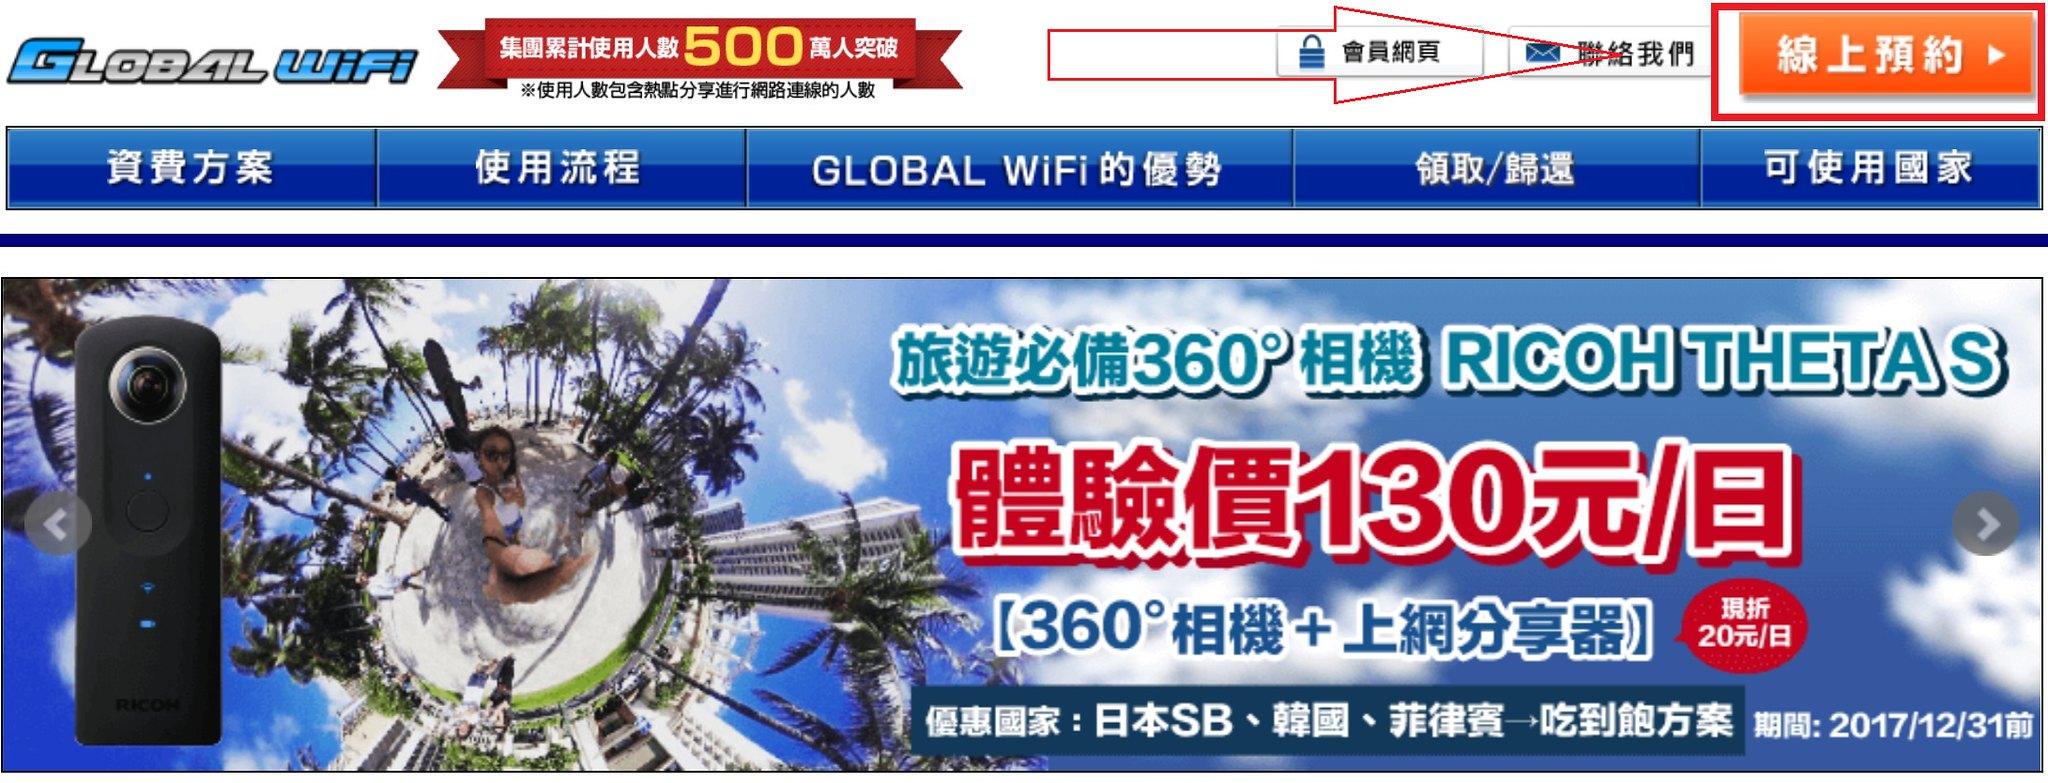 wifi 001